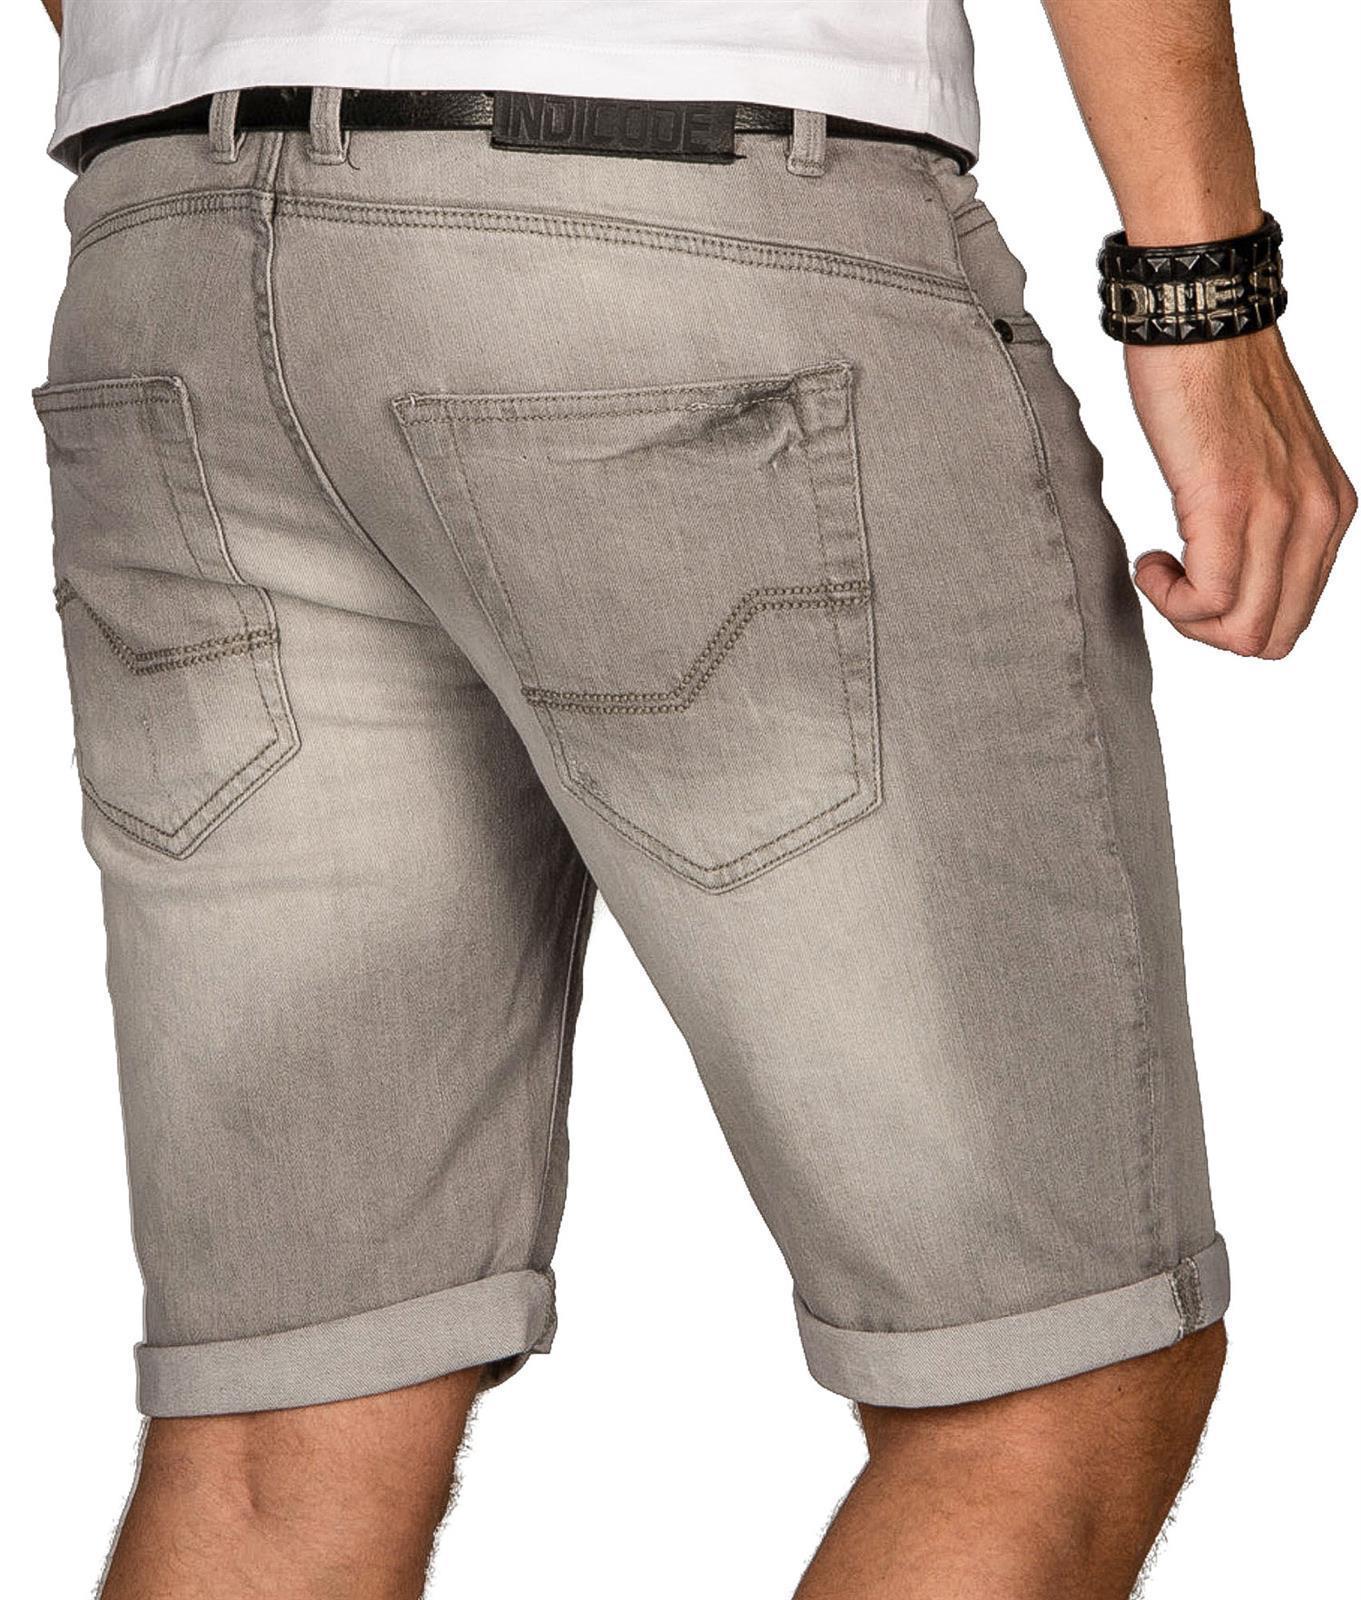 Indicode-Herren-Sommer-Bermuda-Jeans-Shorts-kurze-Hose-Sommerhose-Short-Neu-B556 Indexbild 20